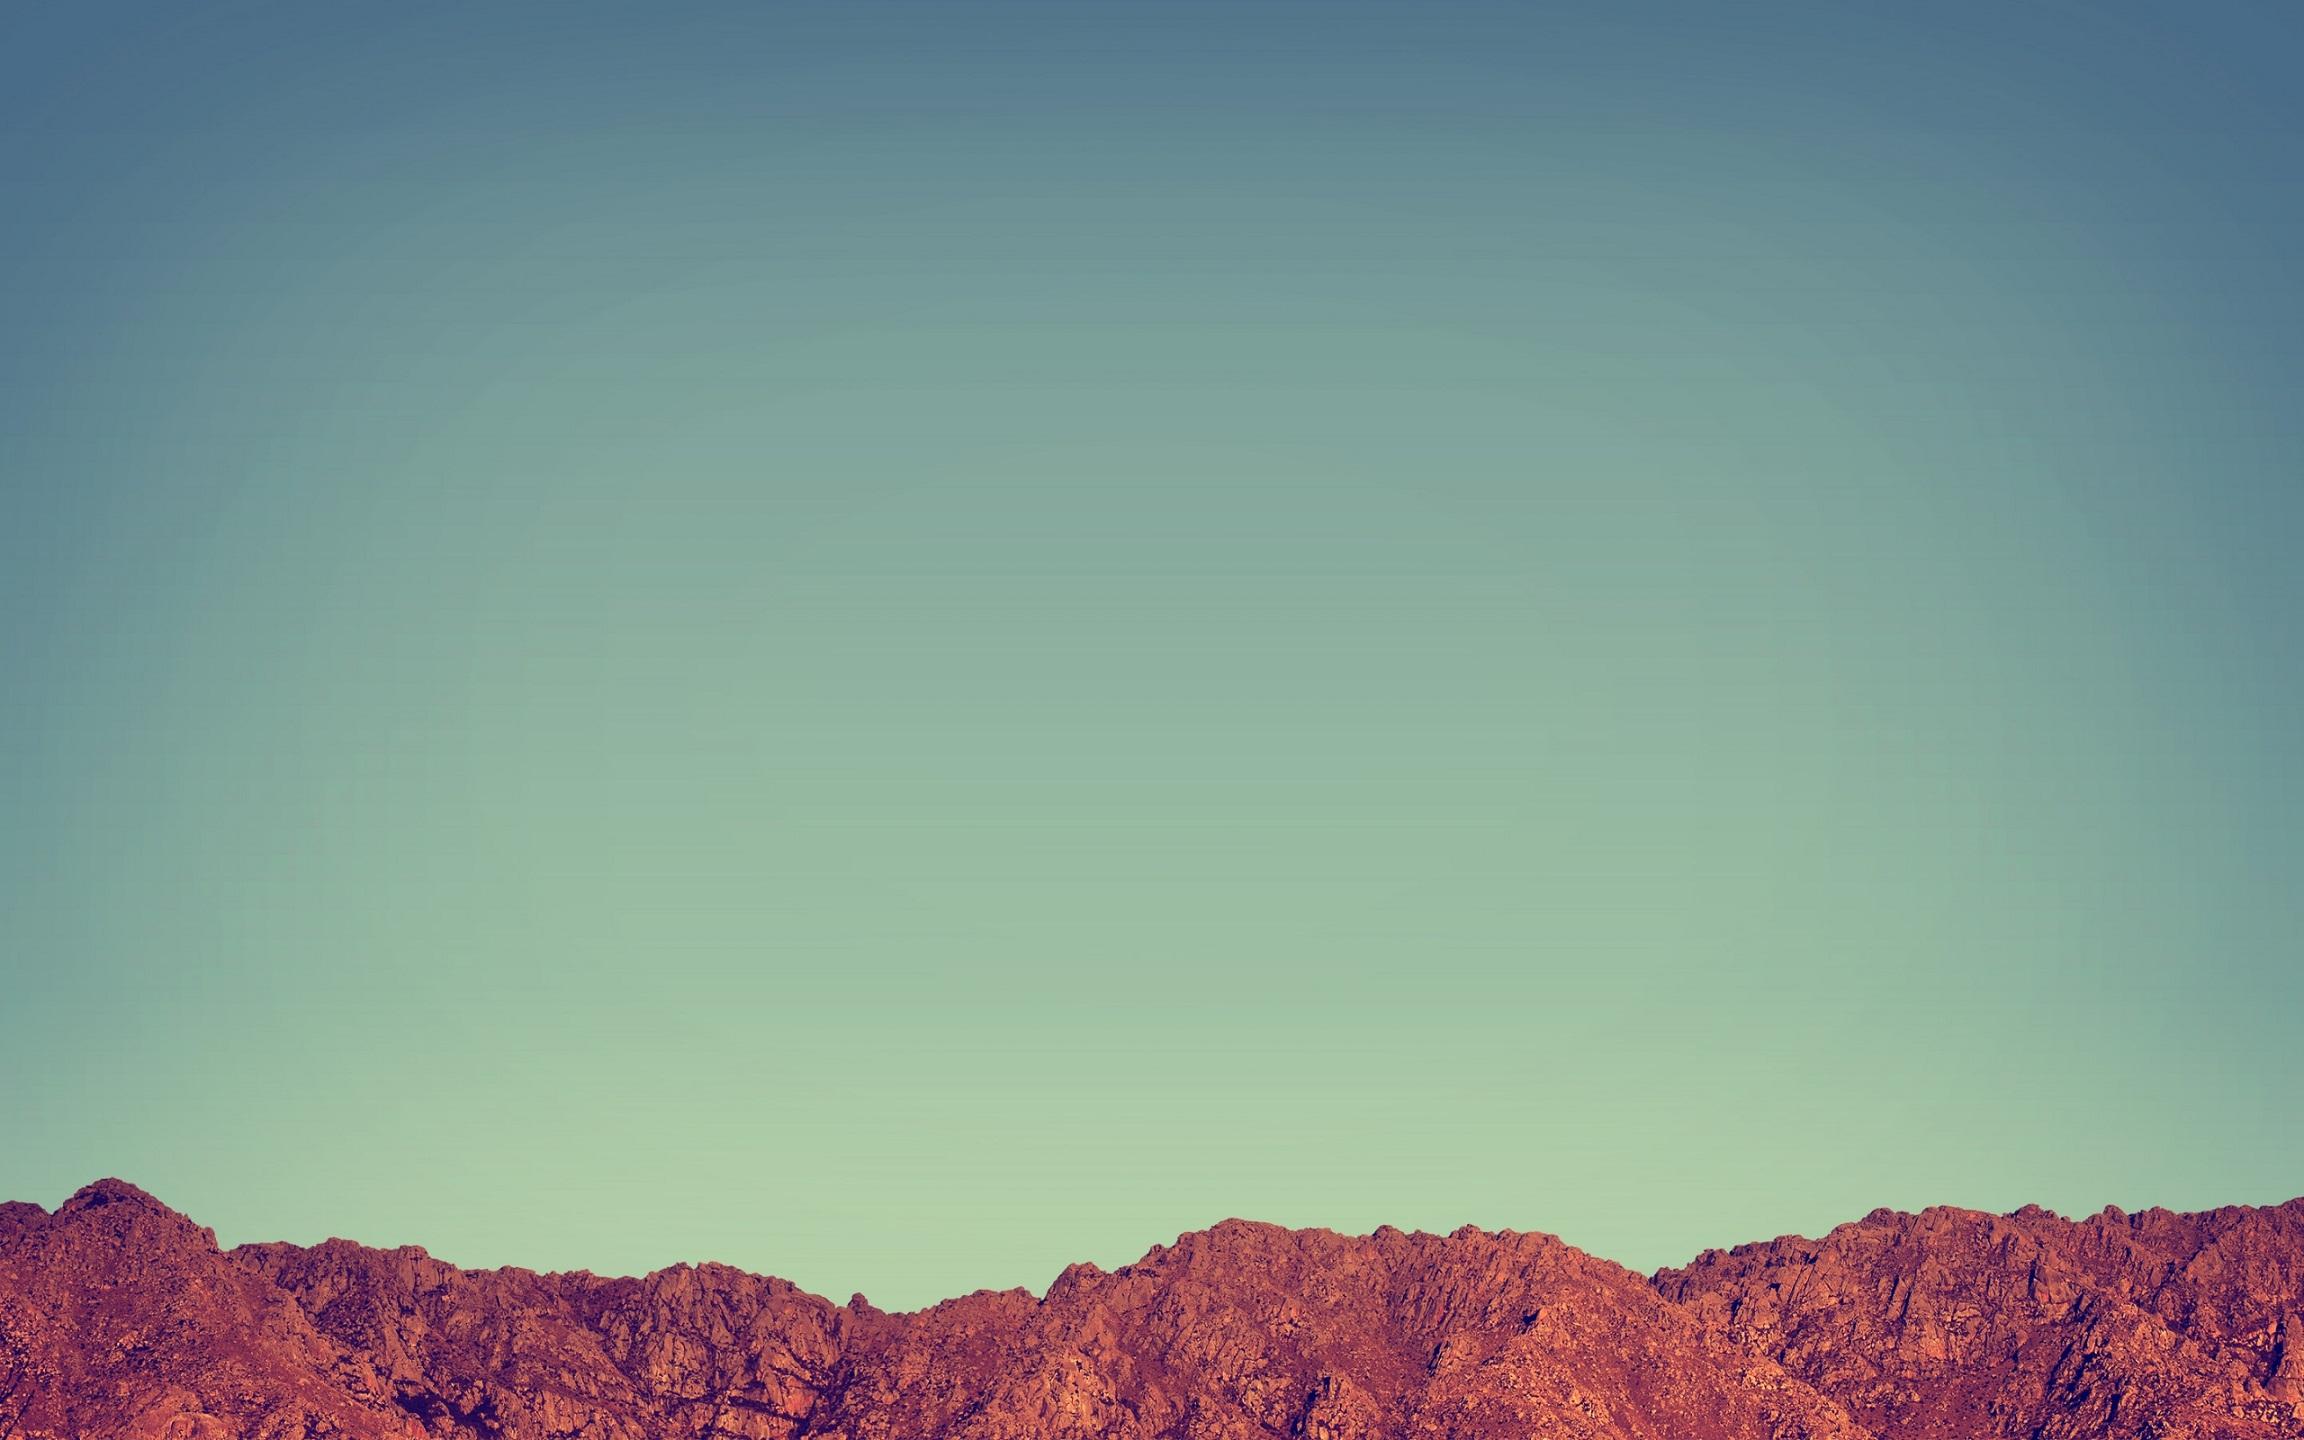 macbook wallpaper tumblr - photo #4